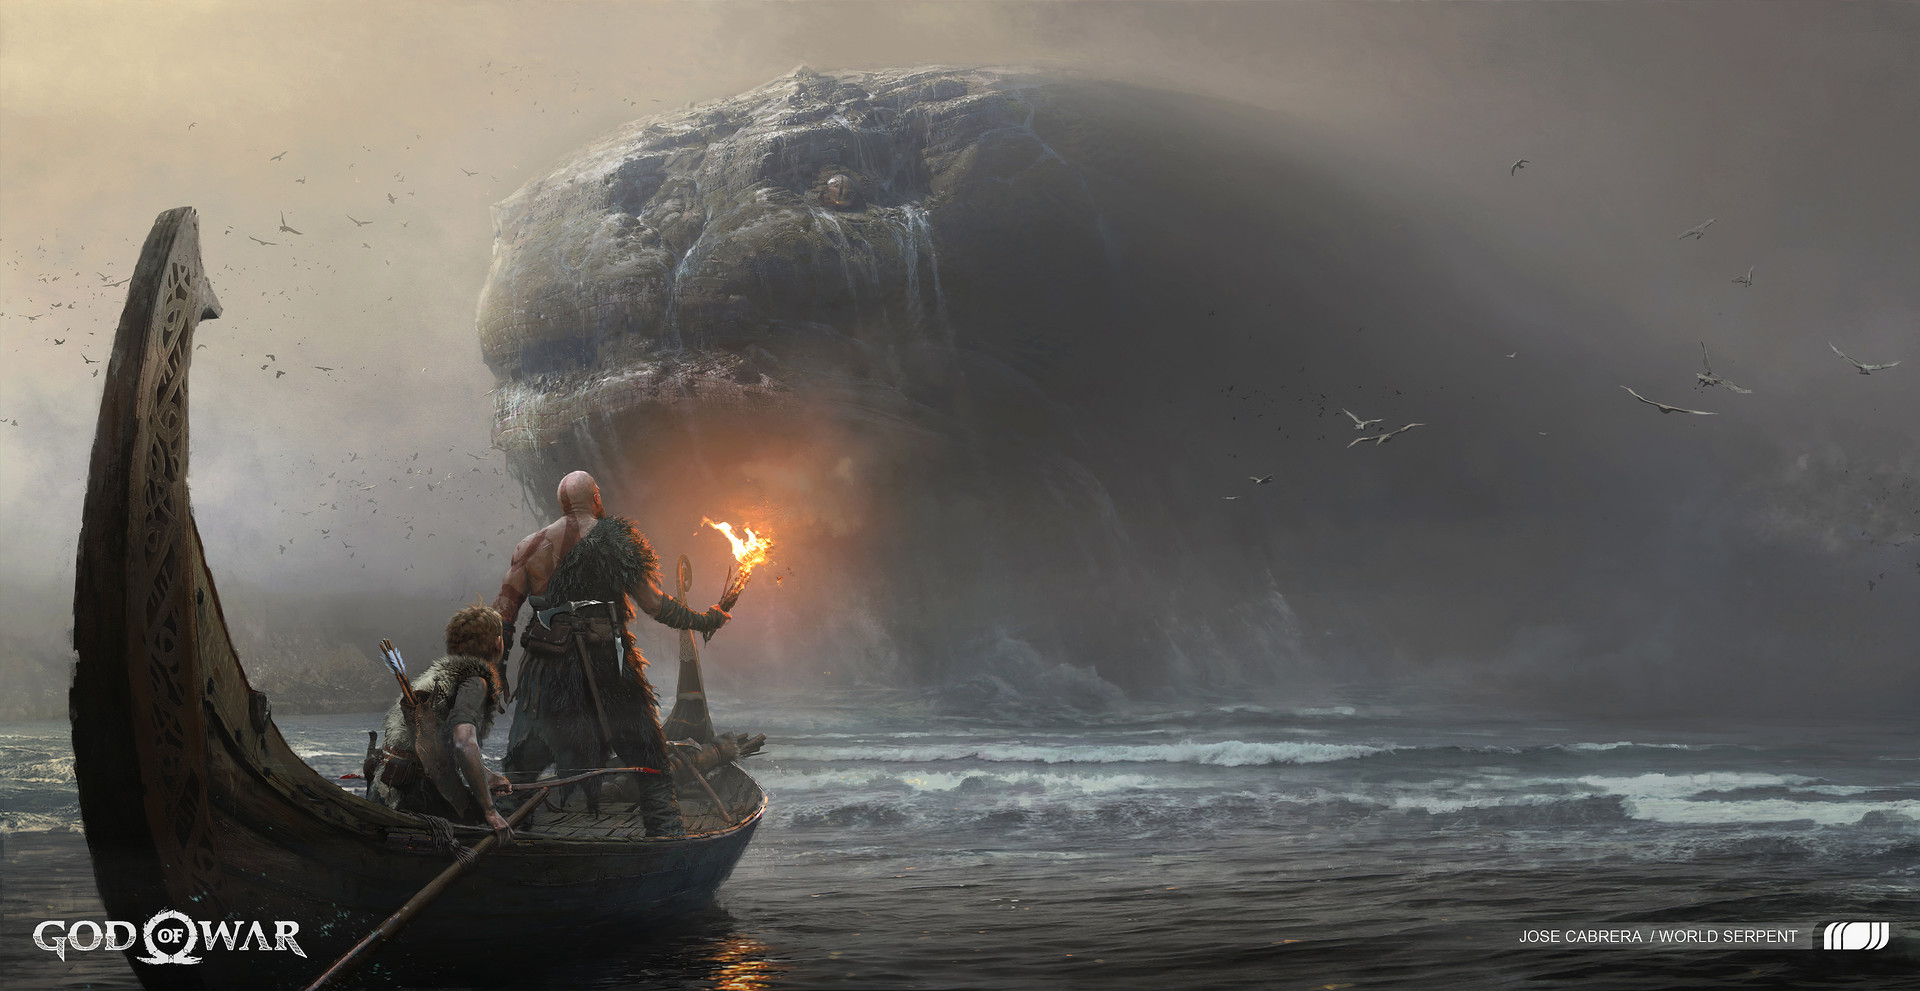 Kratos god of war zerochan anime image board - God of war jormungandr ...